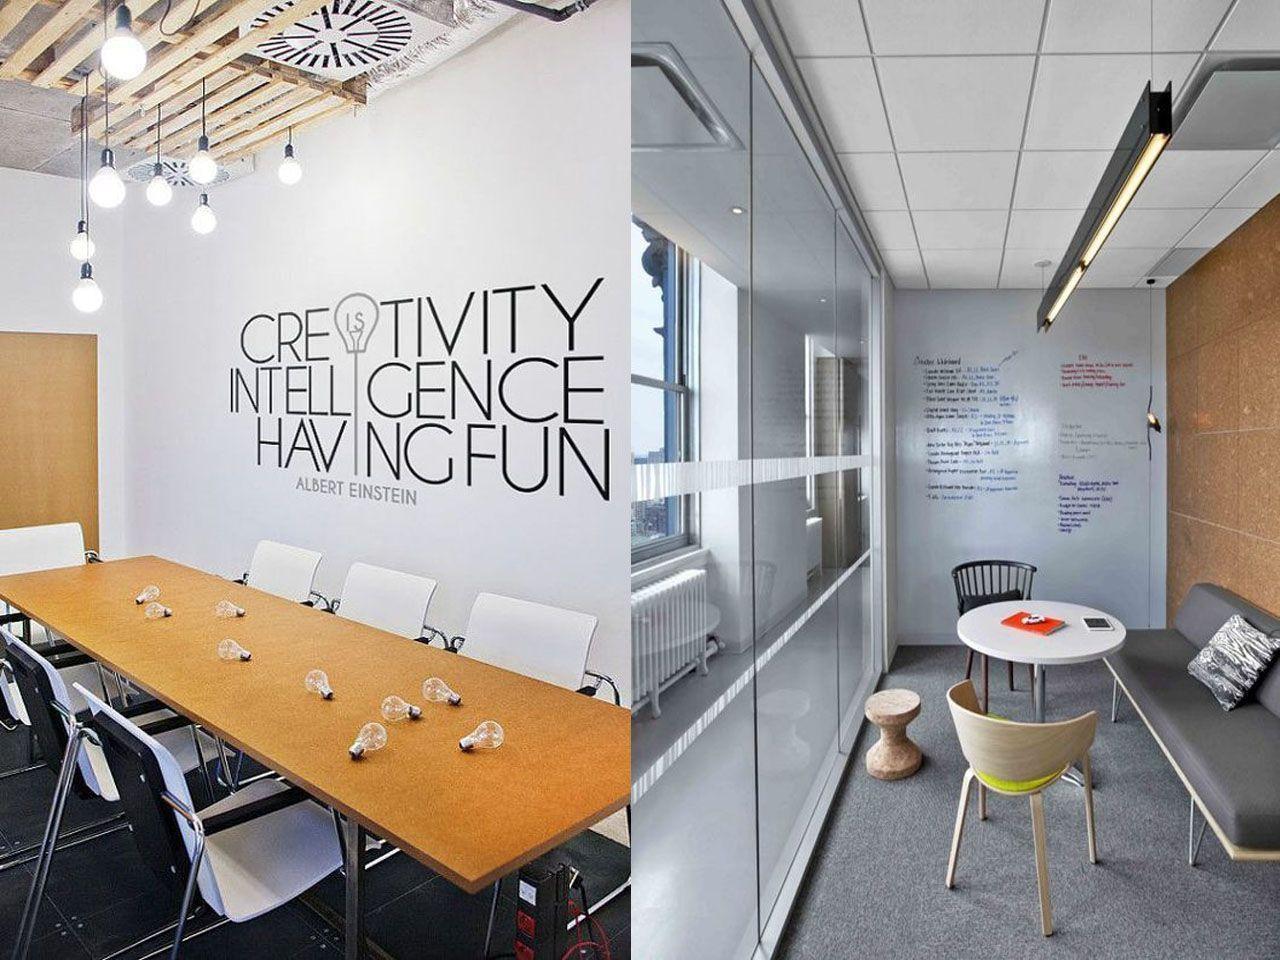 7 Fantsticas Ideas De Decoracin Oficinas Modernas Recepcion Decoracion Oficina Moderna